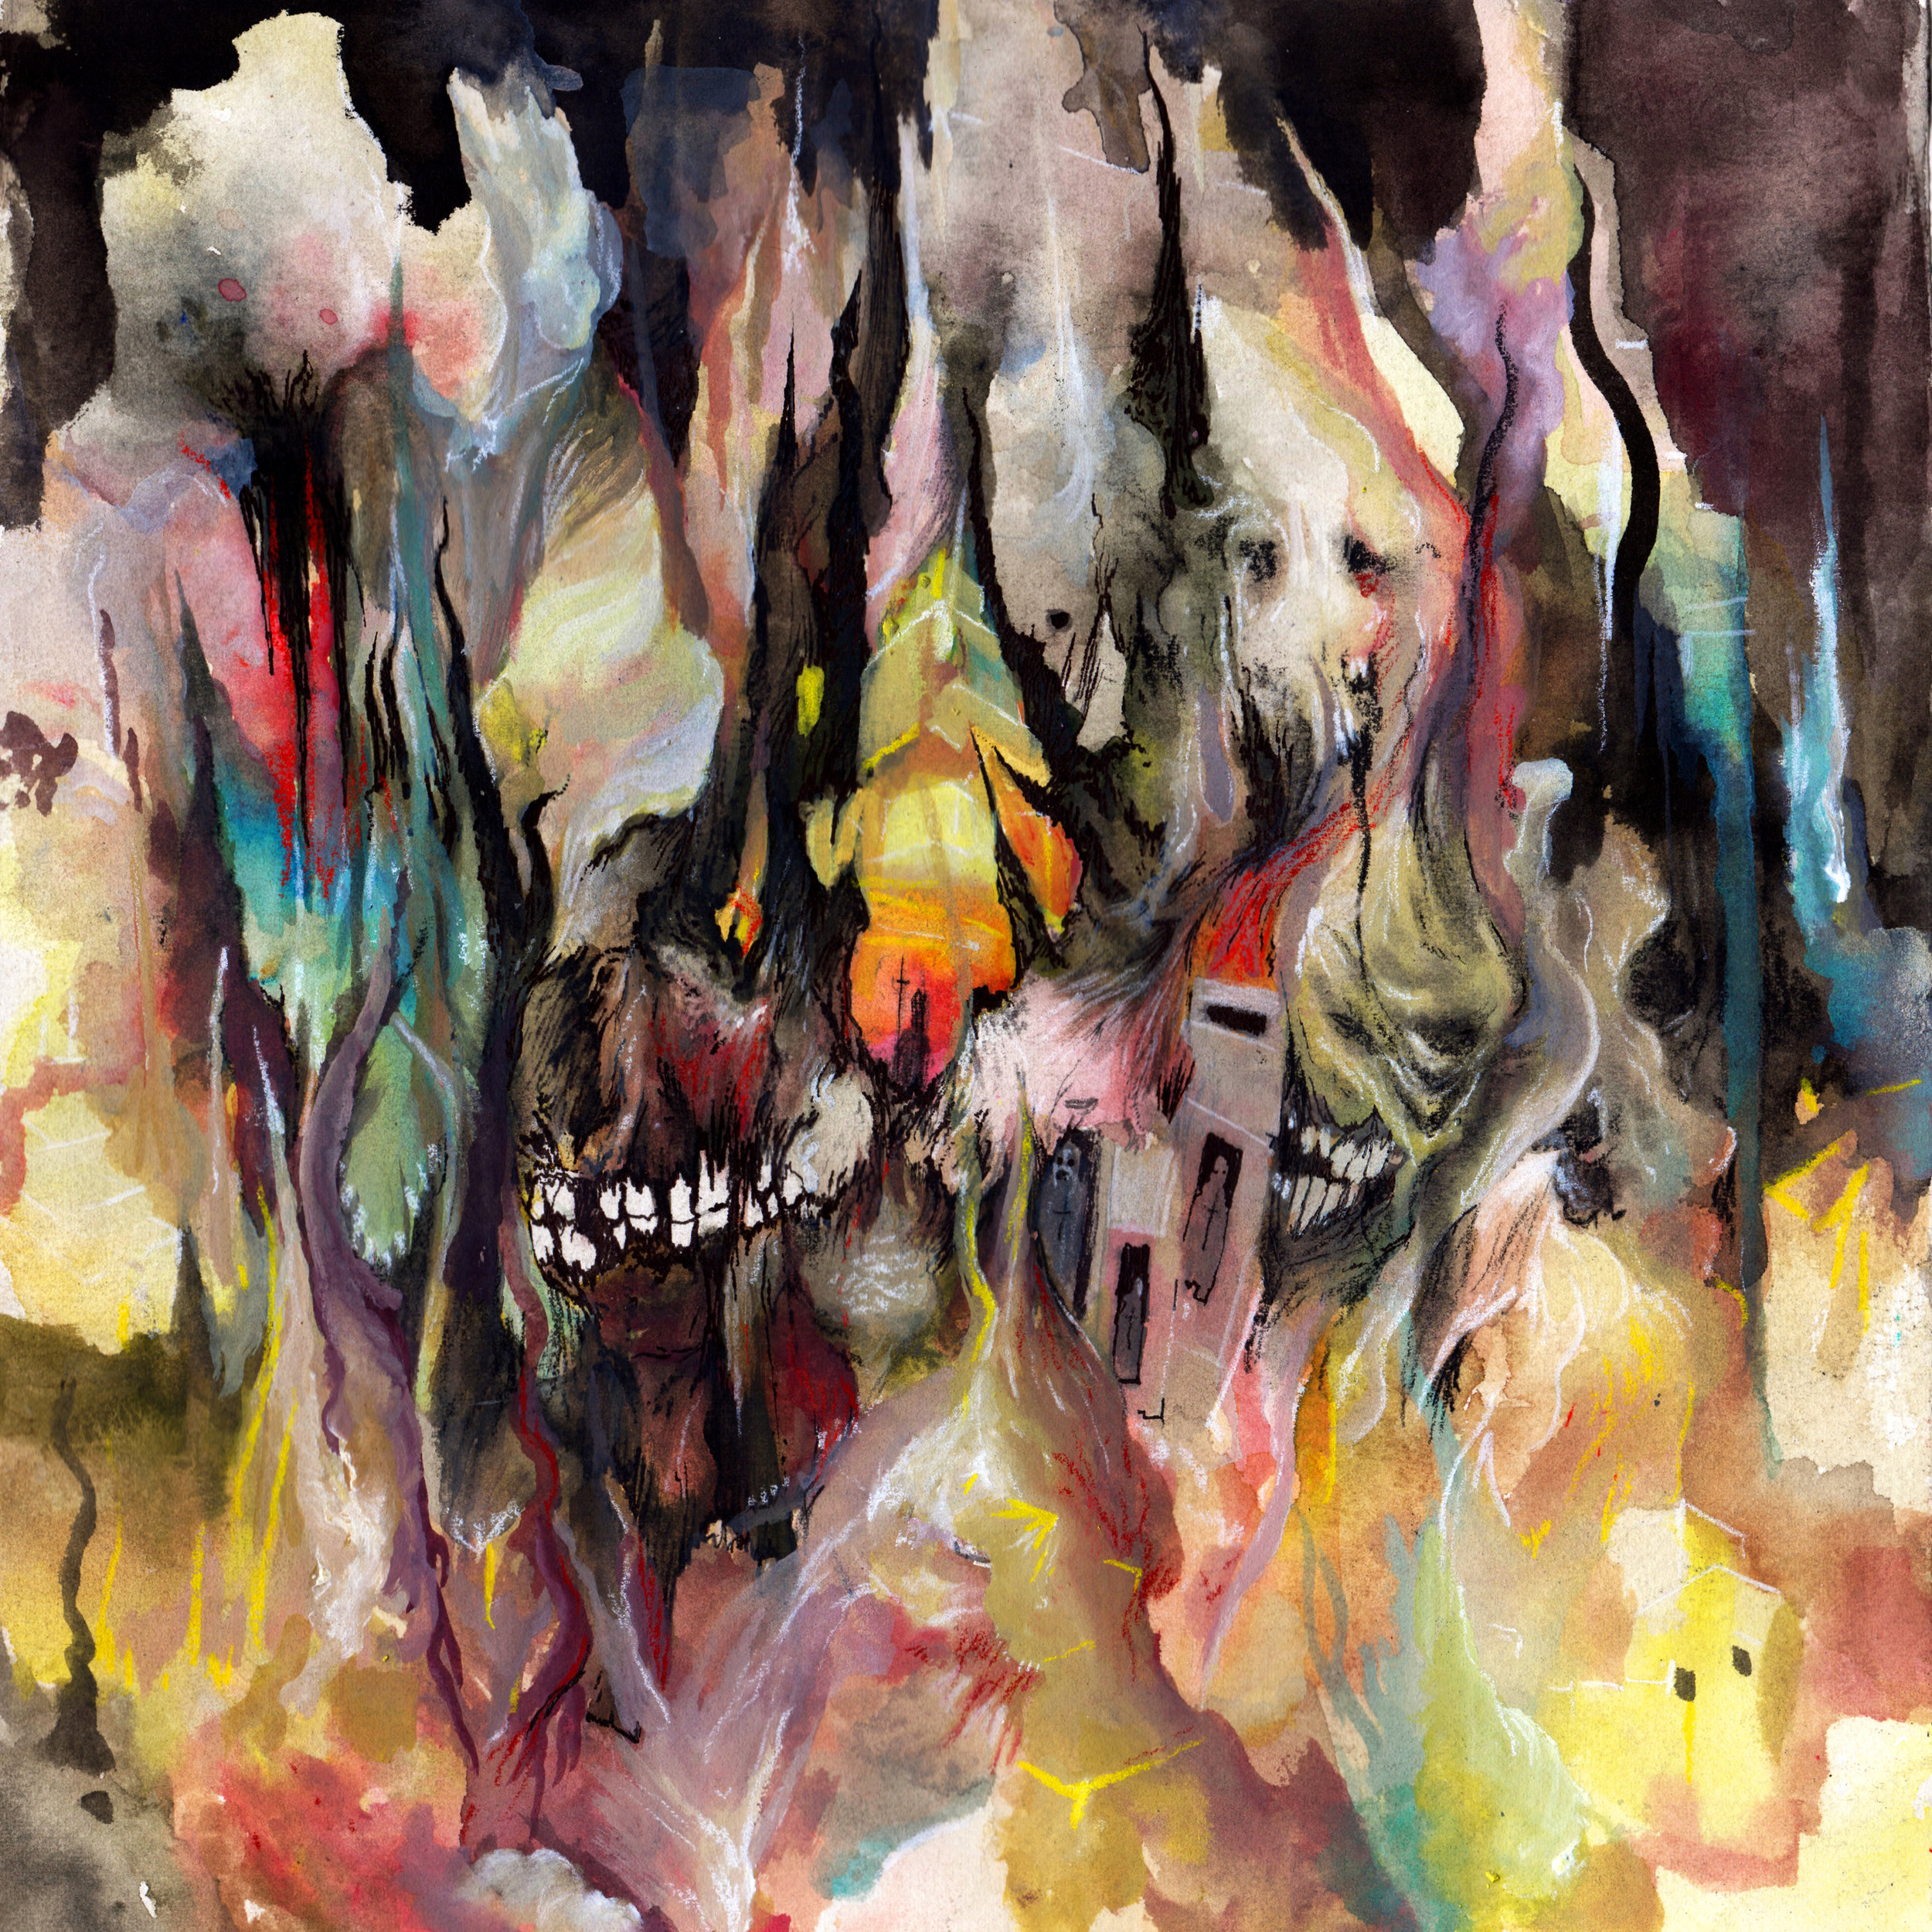 2015. Cover design for Yautja/Forn split. Released through Gilead Media.